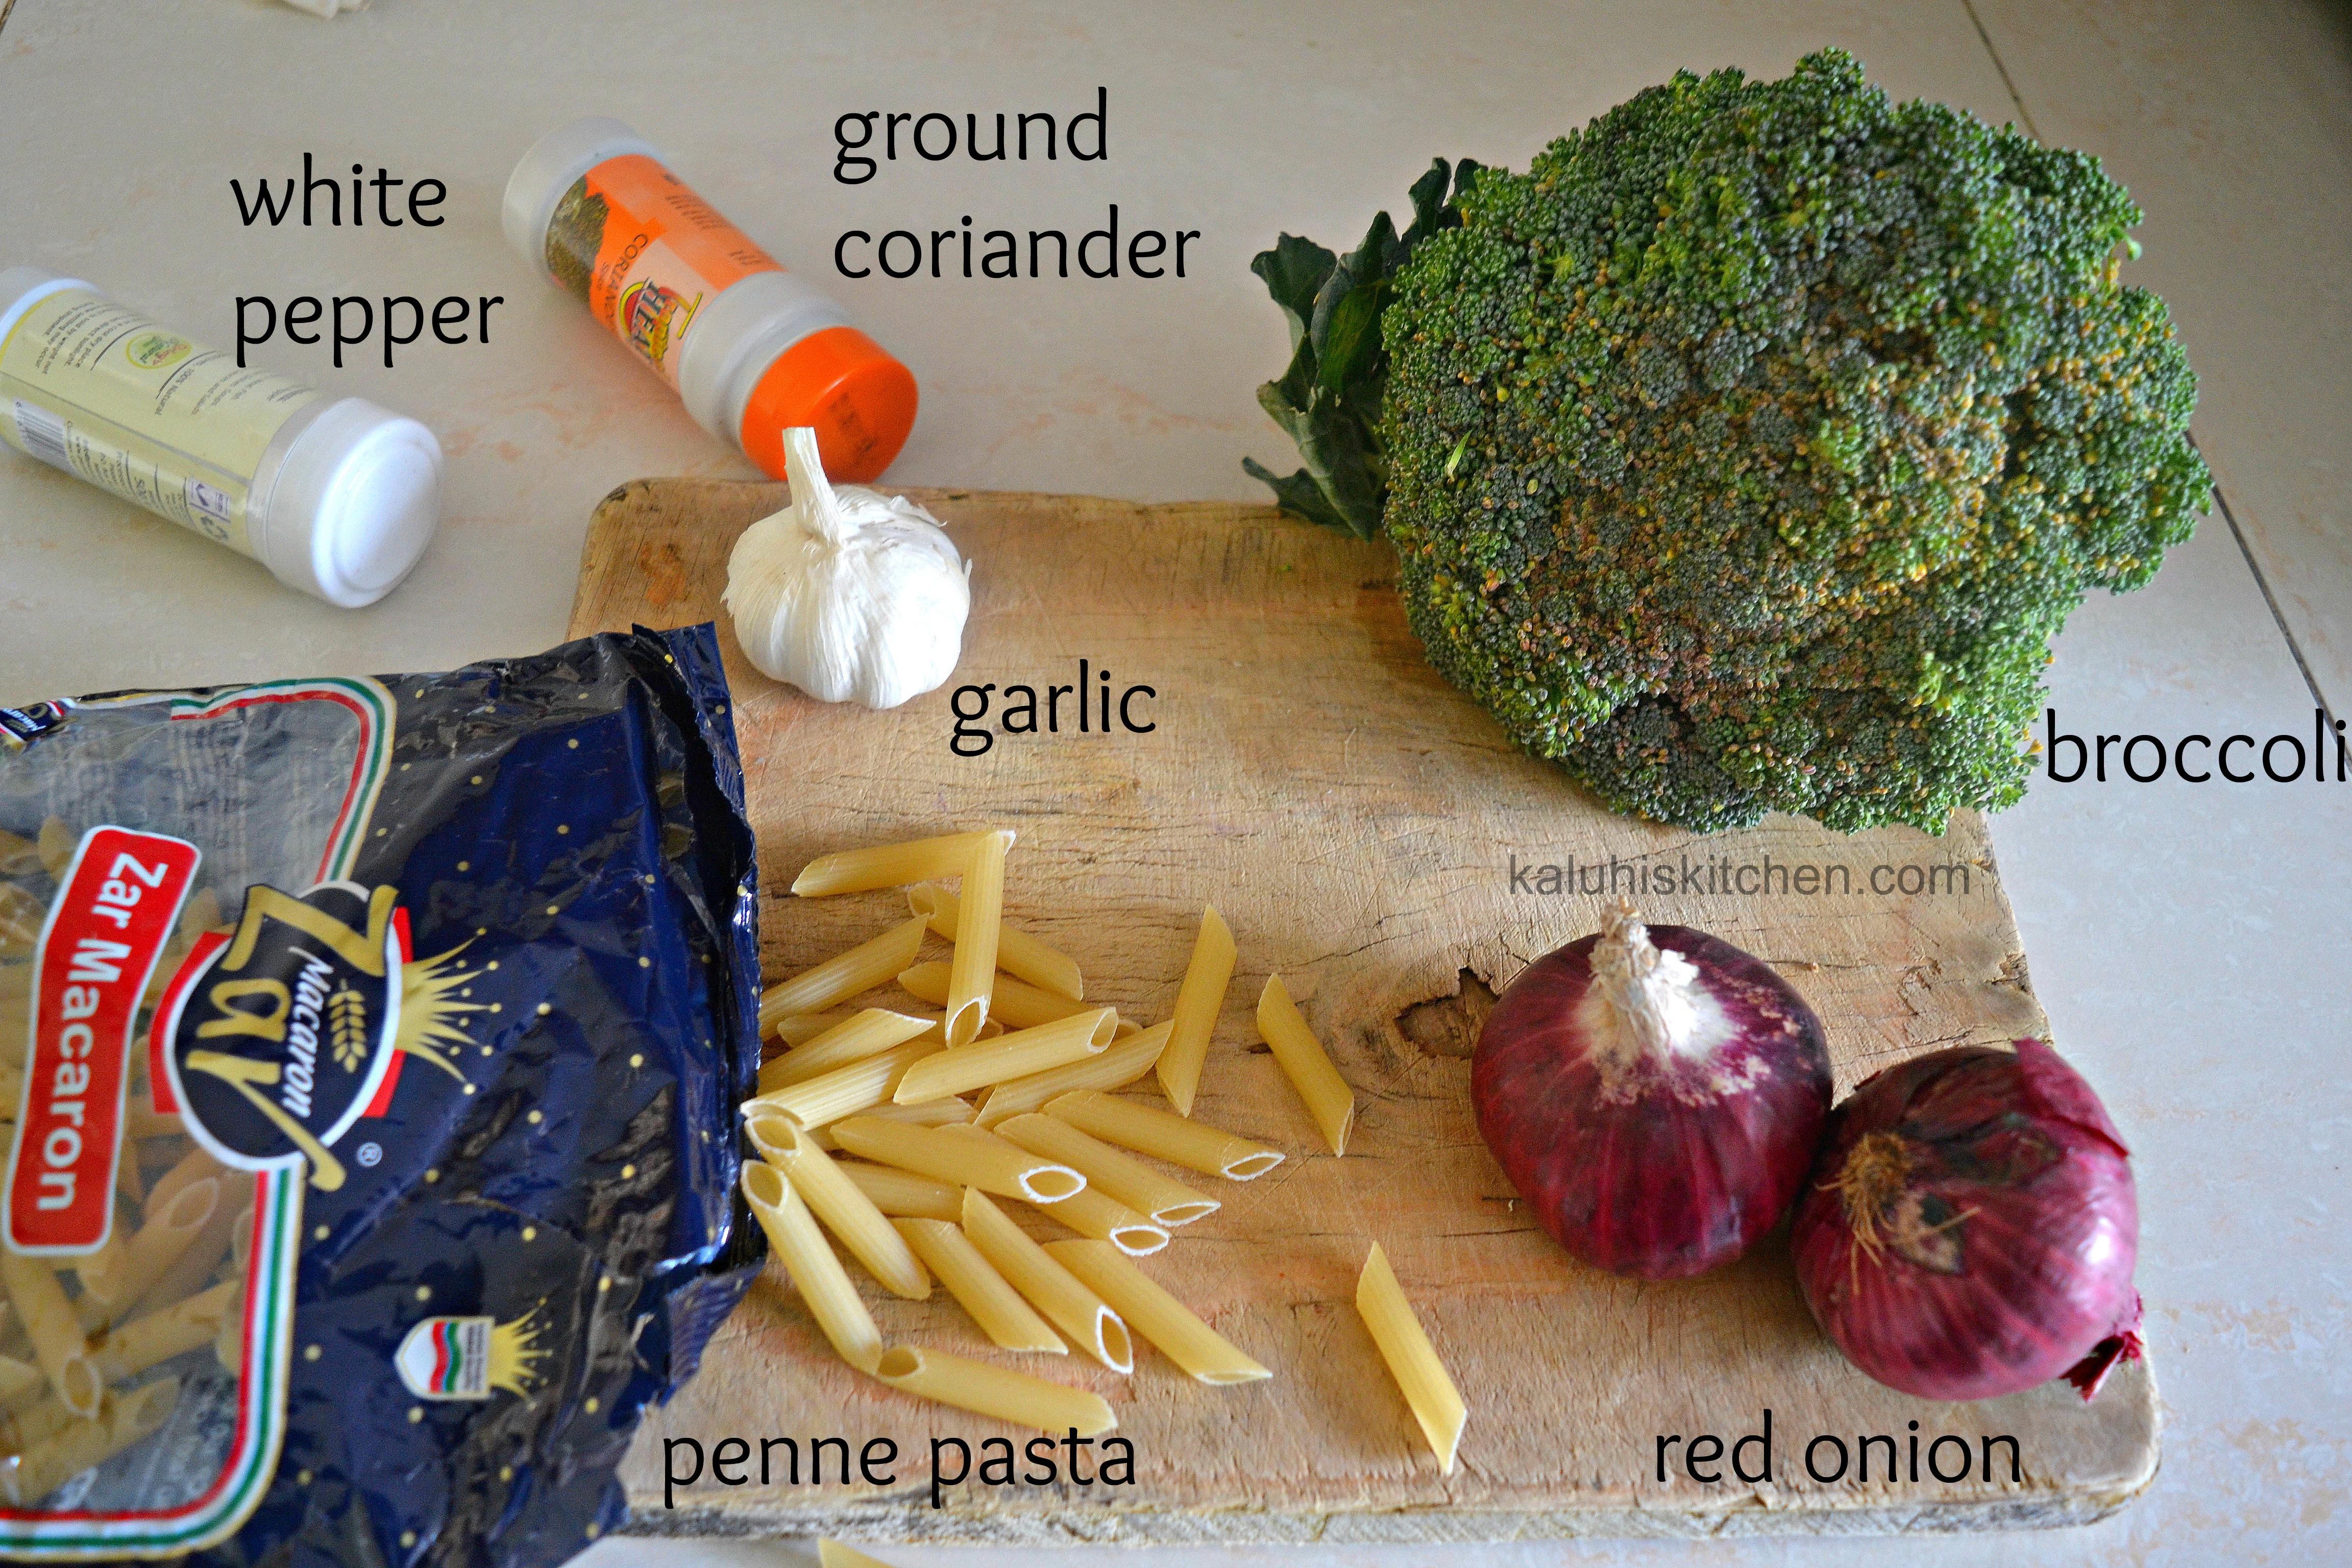 garlic and broccoli penne stir fry_ingredients fro a pasta stir fry_kaluhiskitchen.com